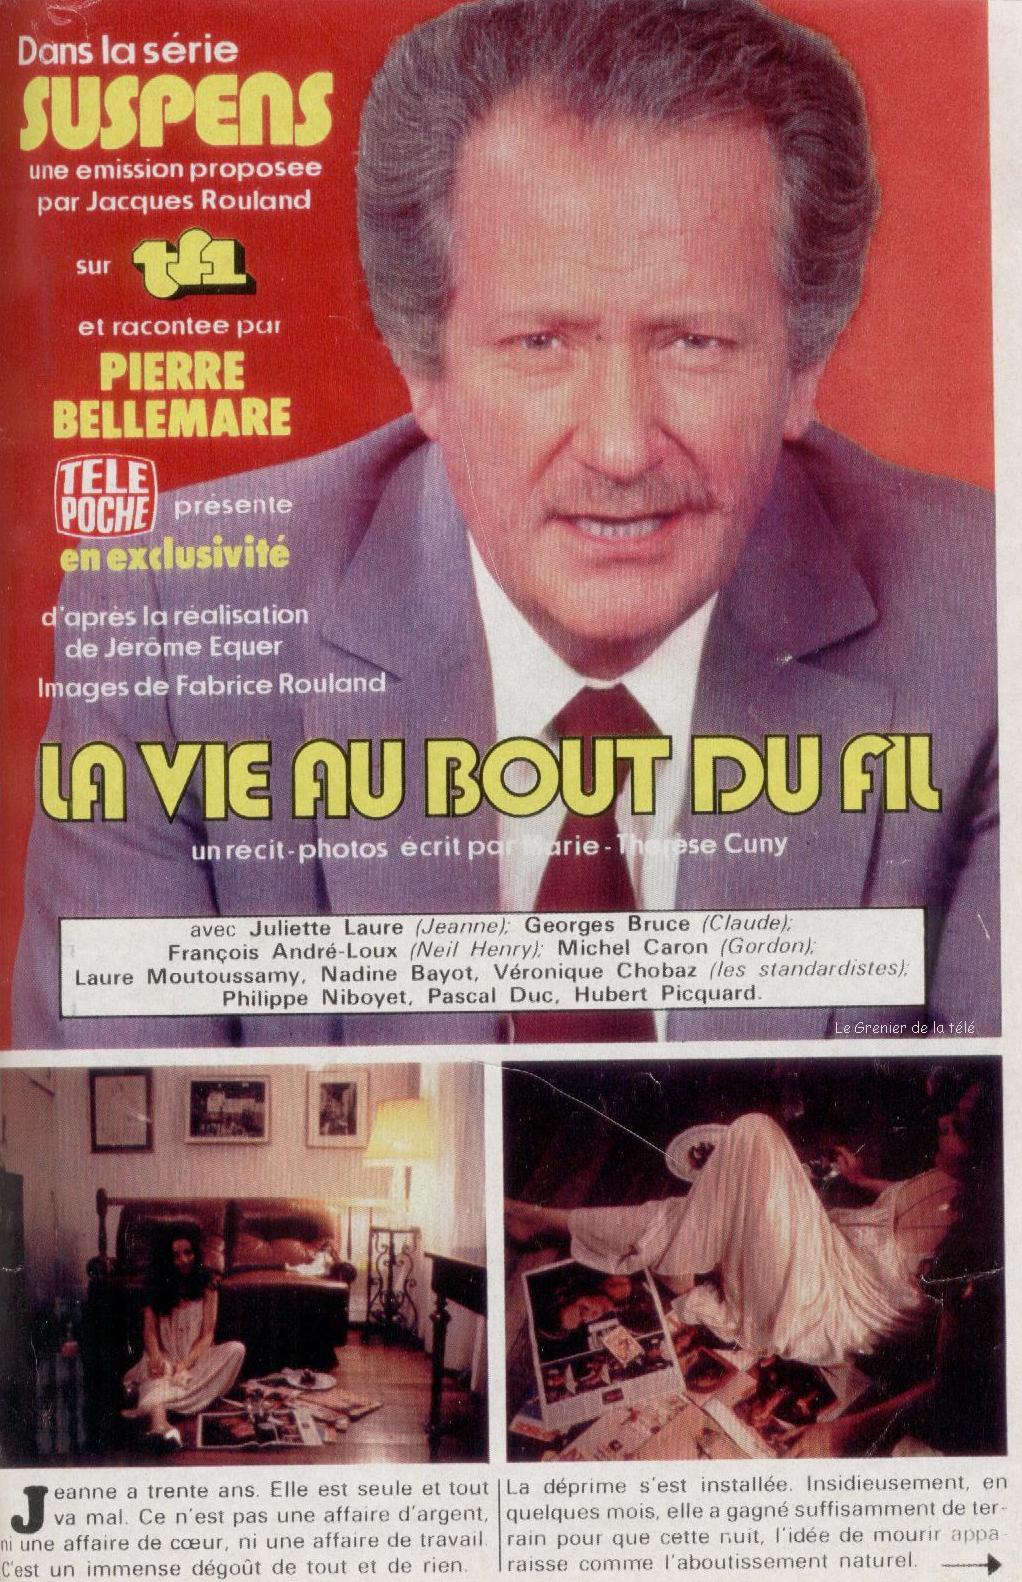 http://grenierdelatv.free.fr/bellemareracontetpjuillet198104.jpg